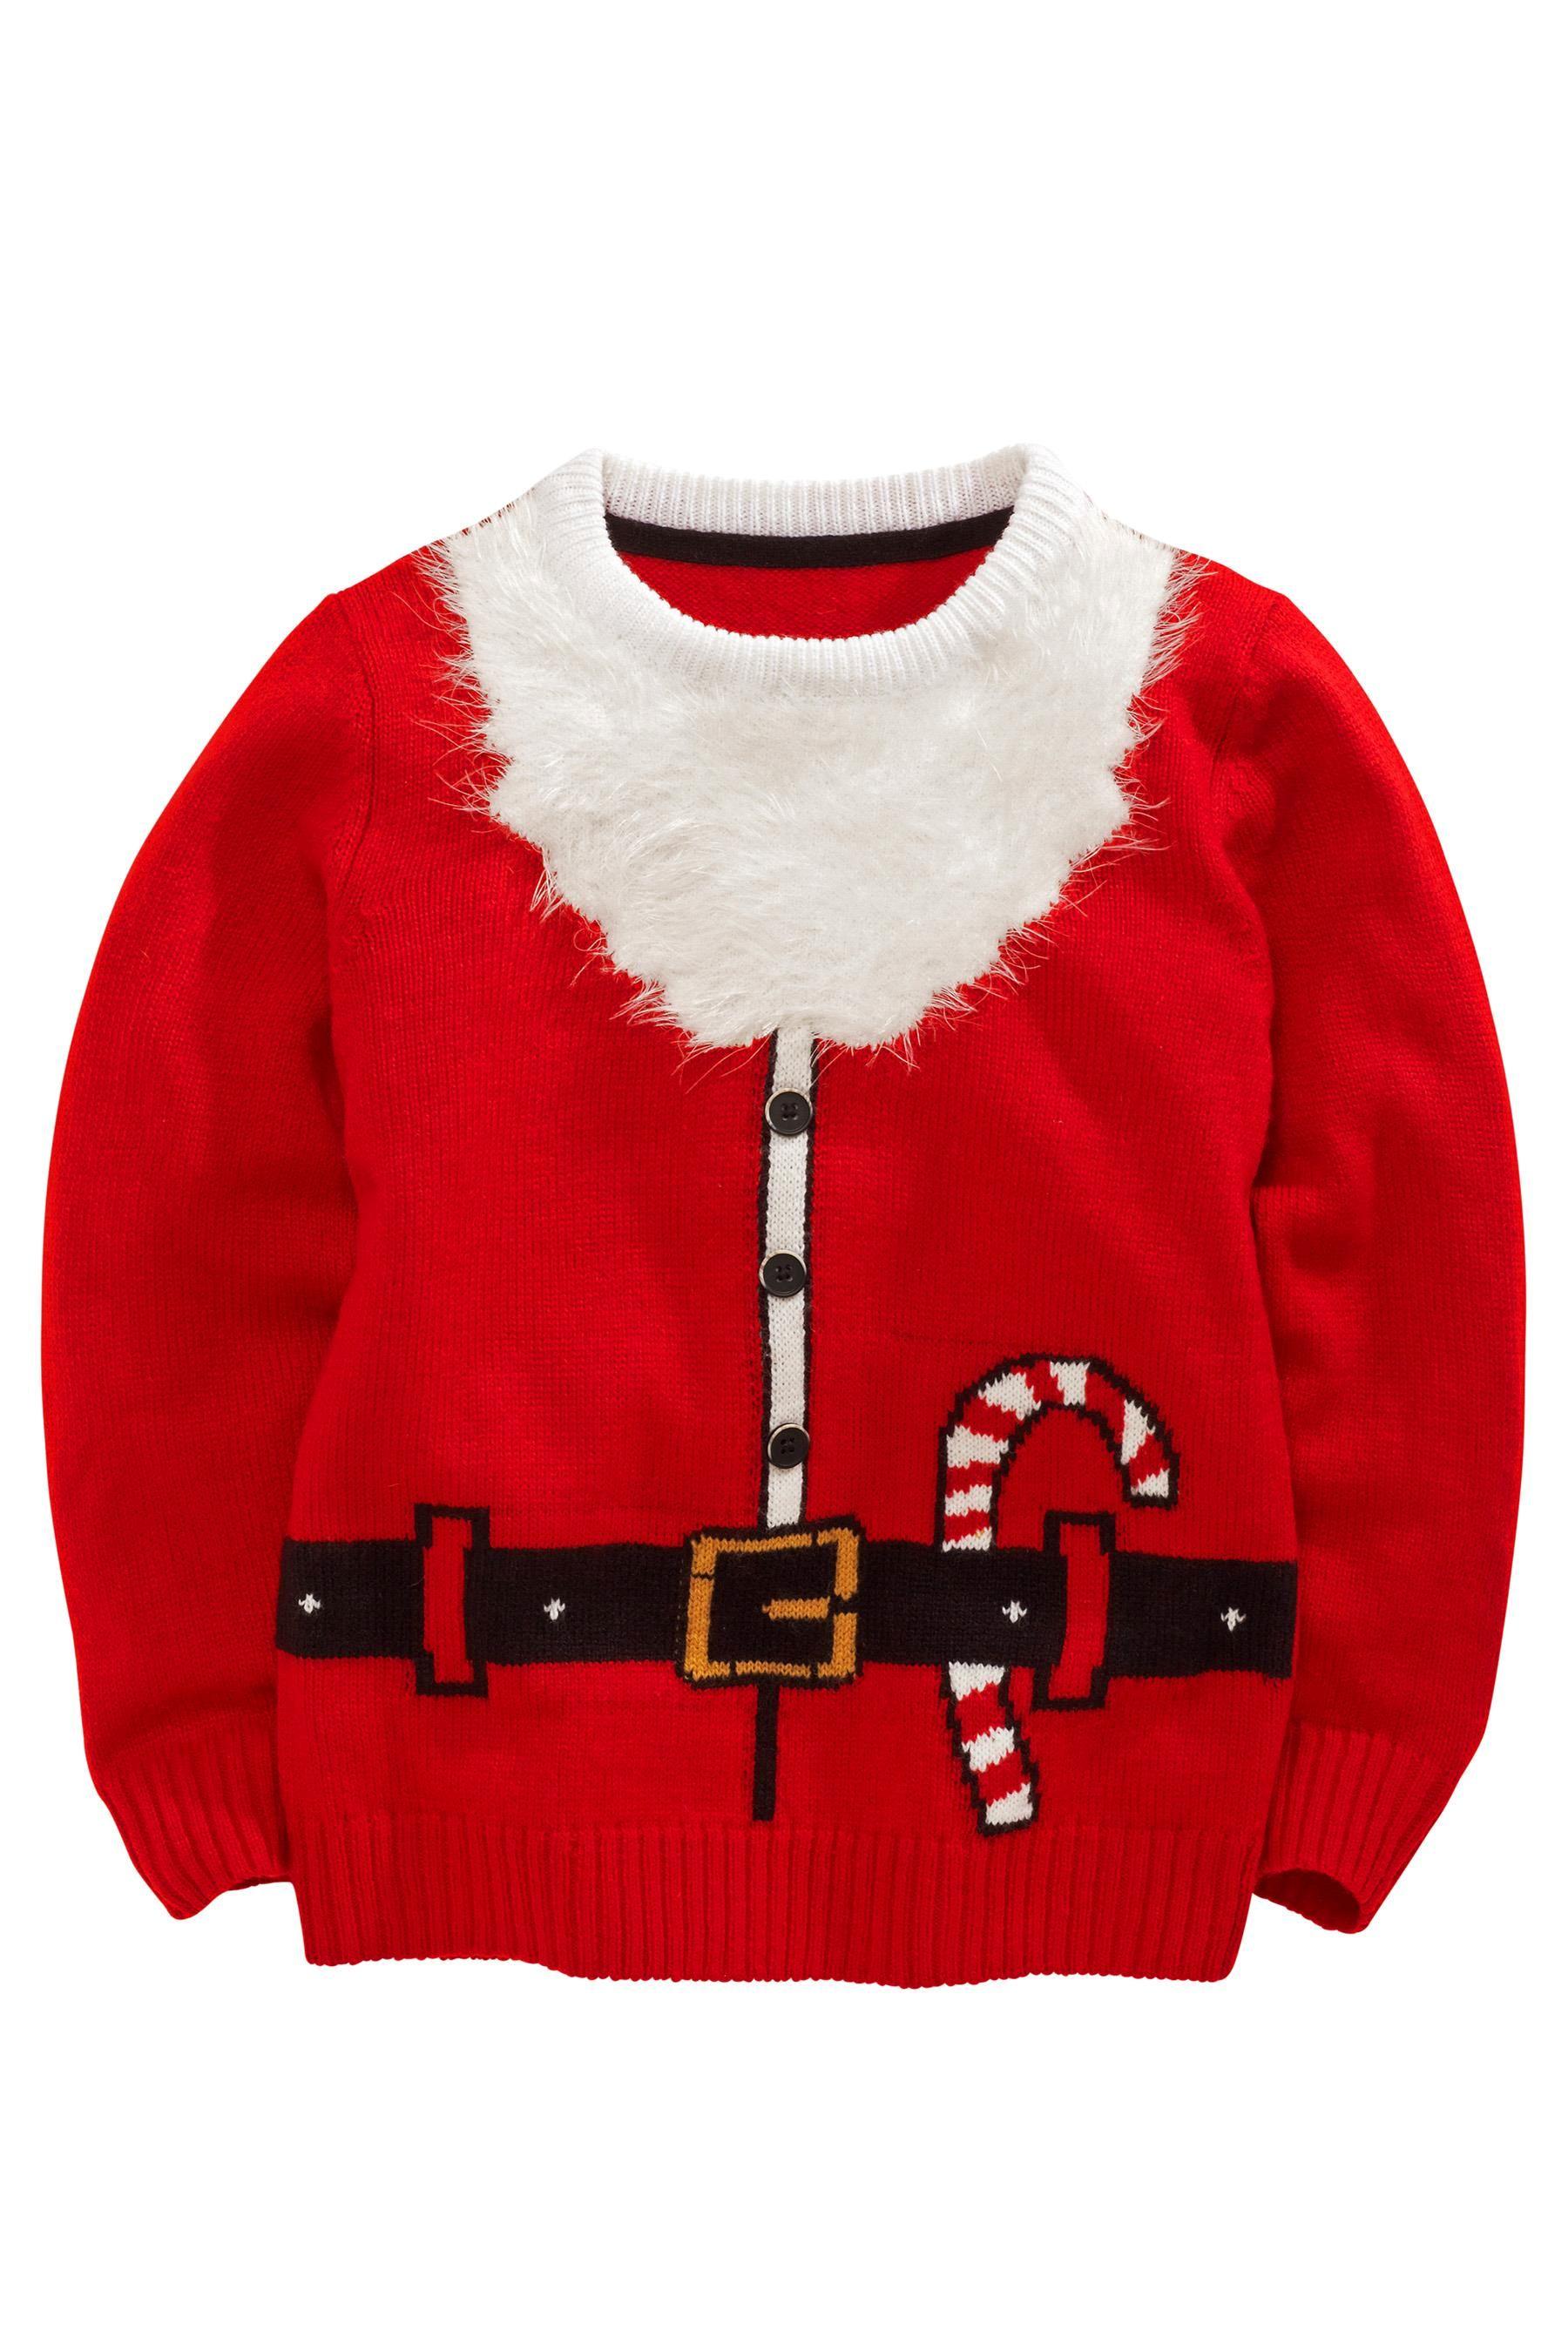 kids christmas jumpers the intrepid hound. Black Bedroom Furniture Sets. Home Design Ideas